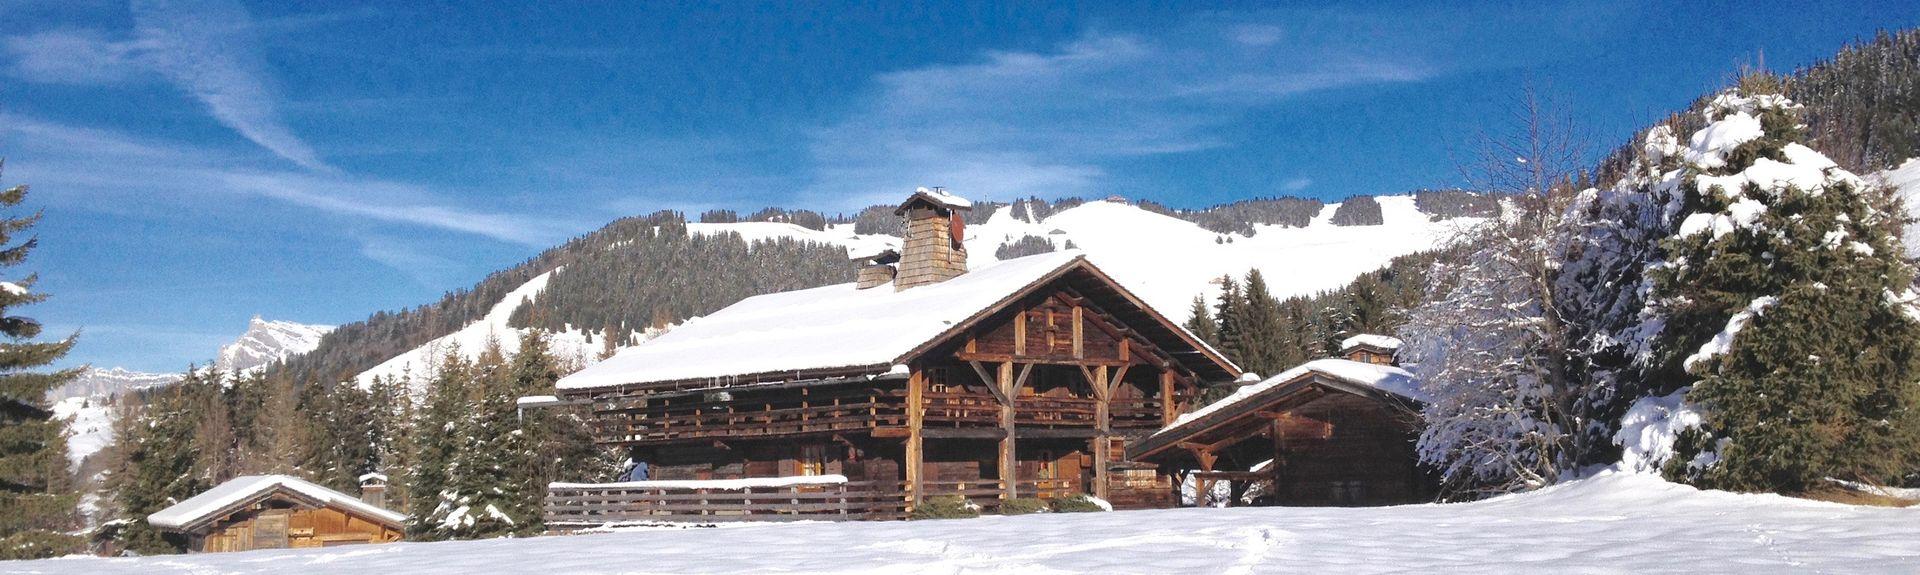 Estación de tren de Chamonix-Mont-Blanc Les Bossons, Chamonix-Mont-Blanc, Alta Saboya (departamento), Francia